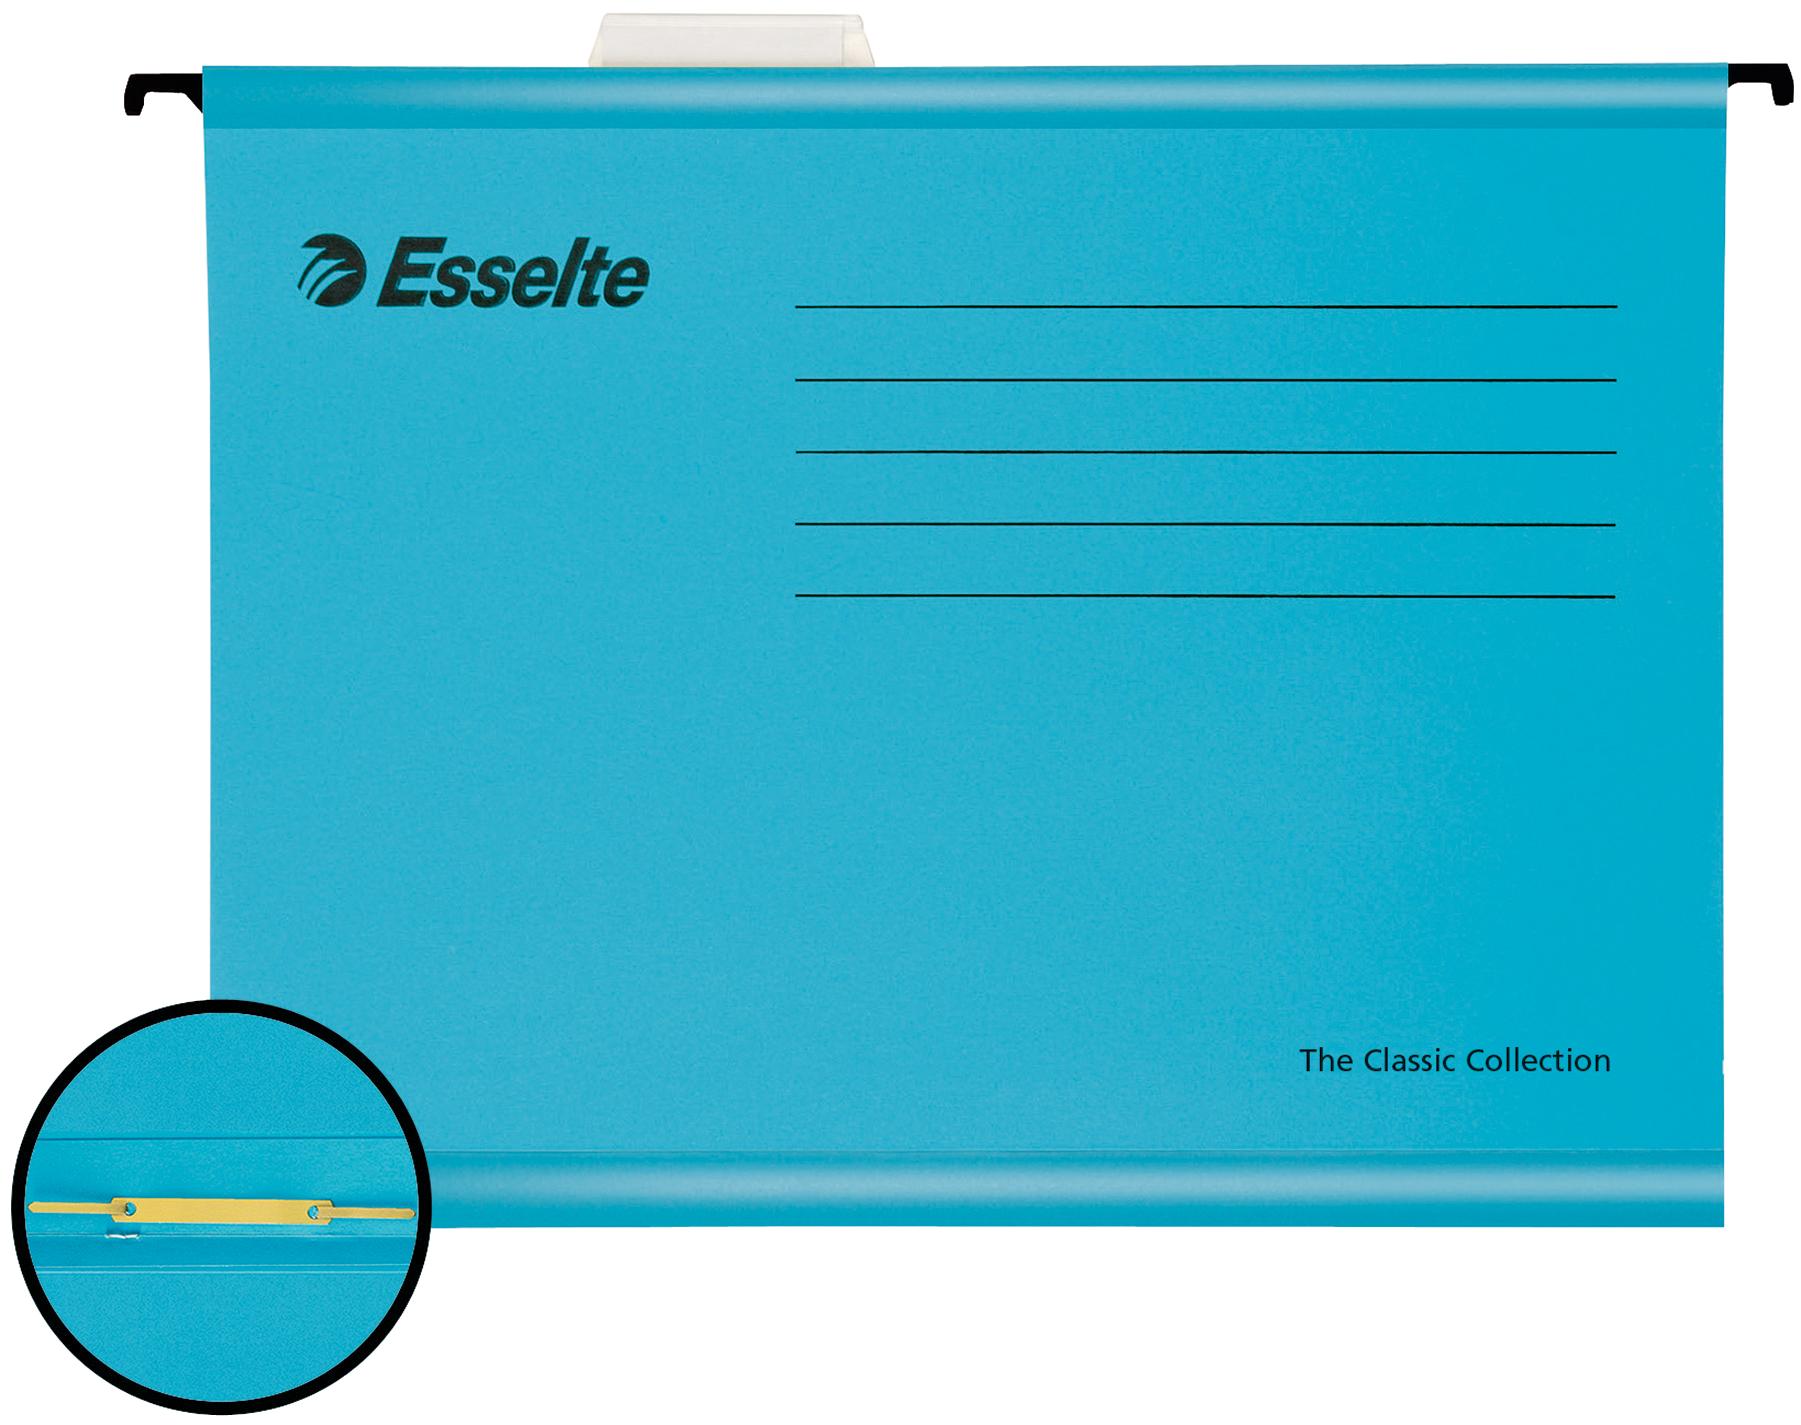 Esselte Pendaflex Reinforced Susp File A4 Blue BX10